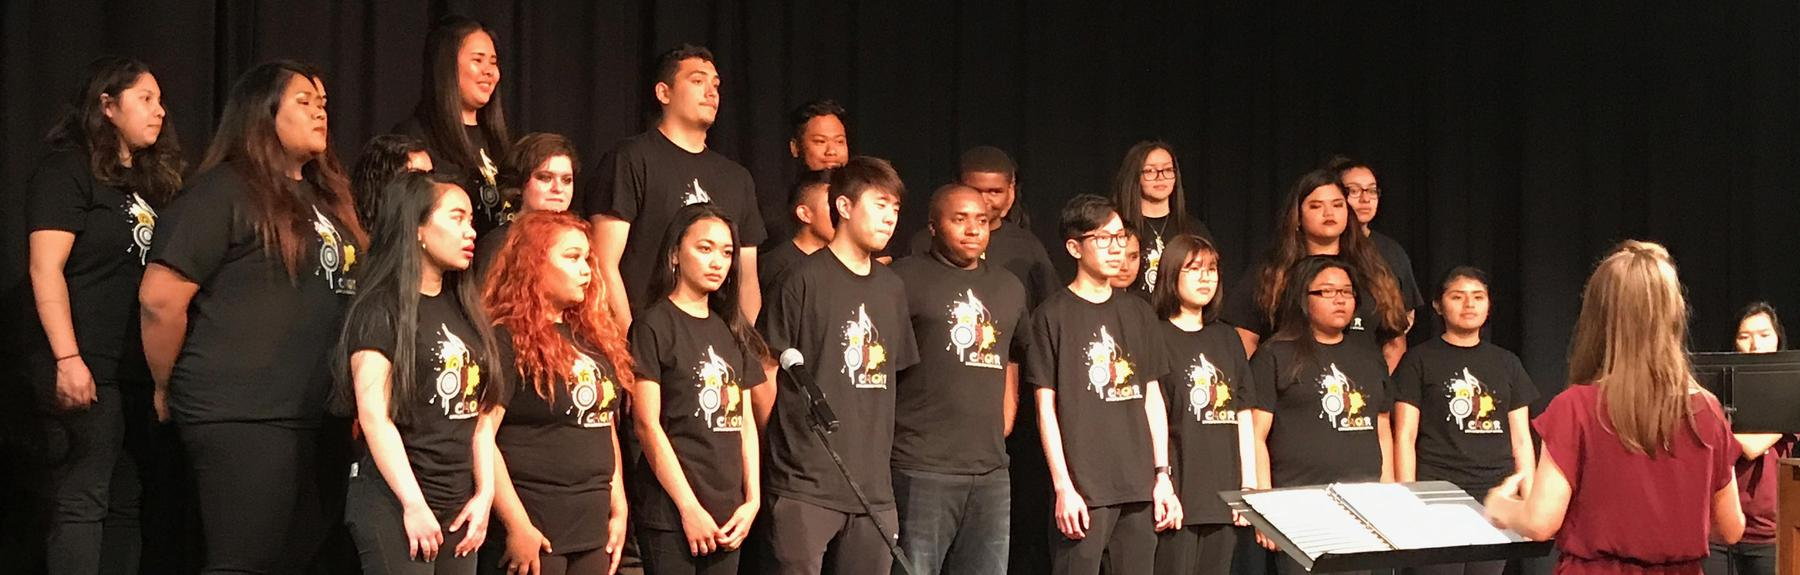 SLZ Choir